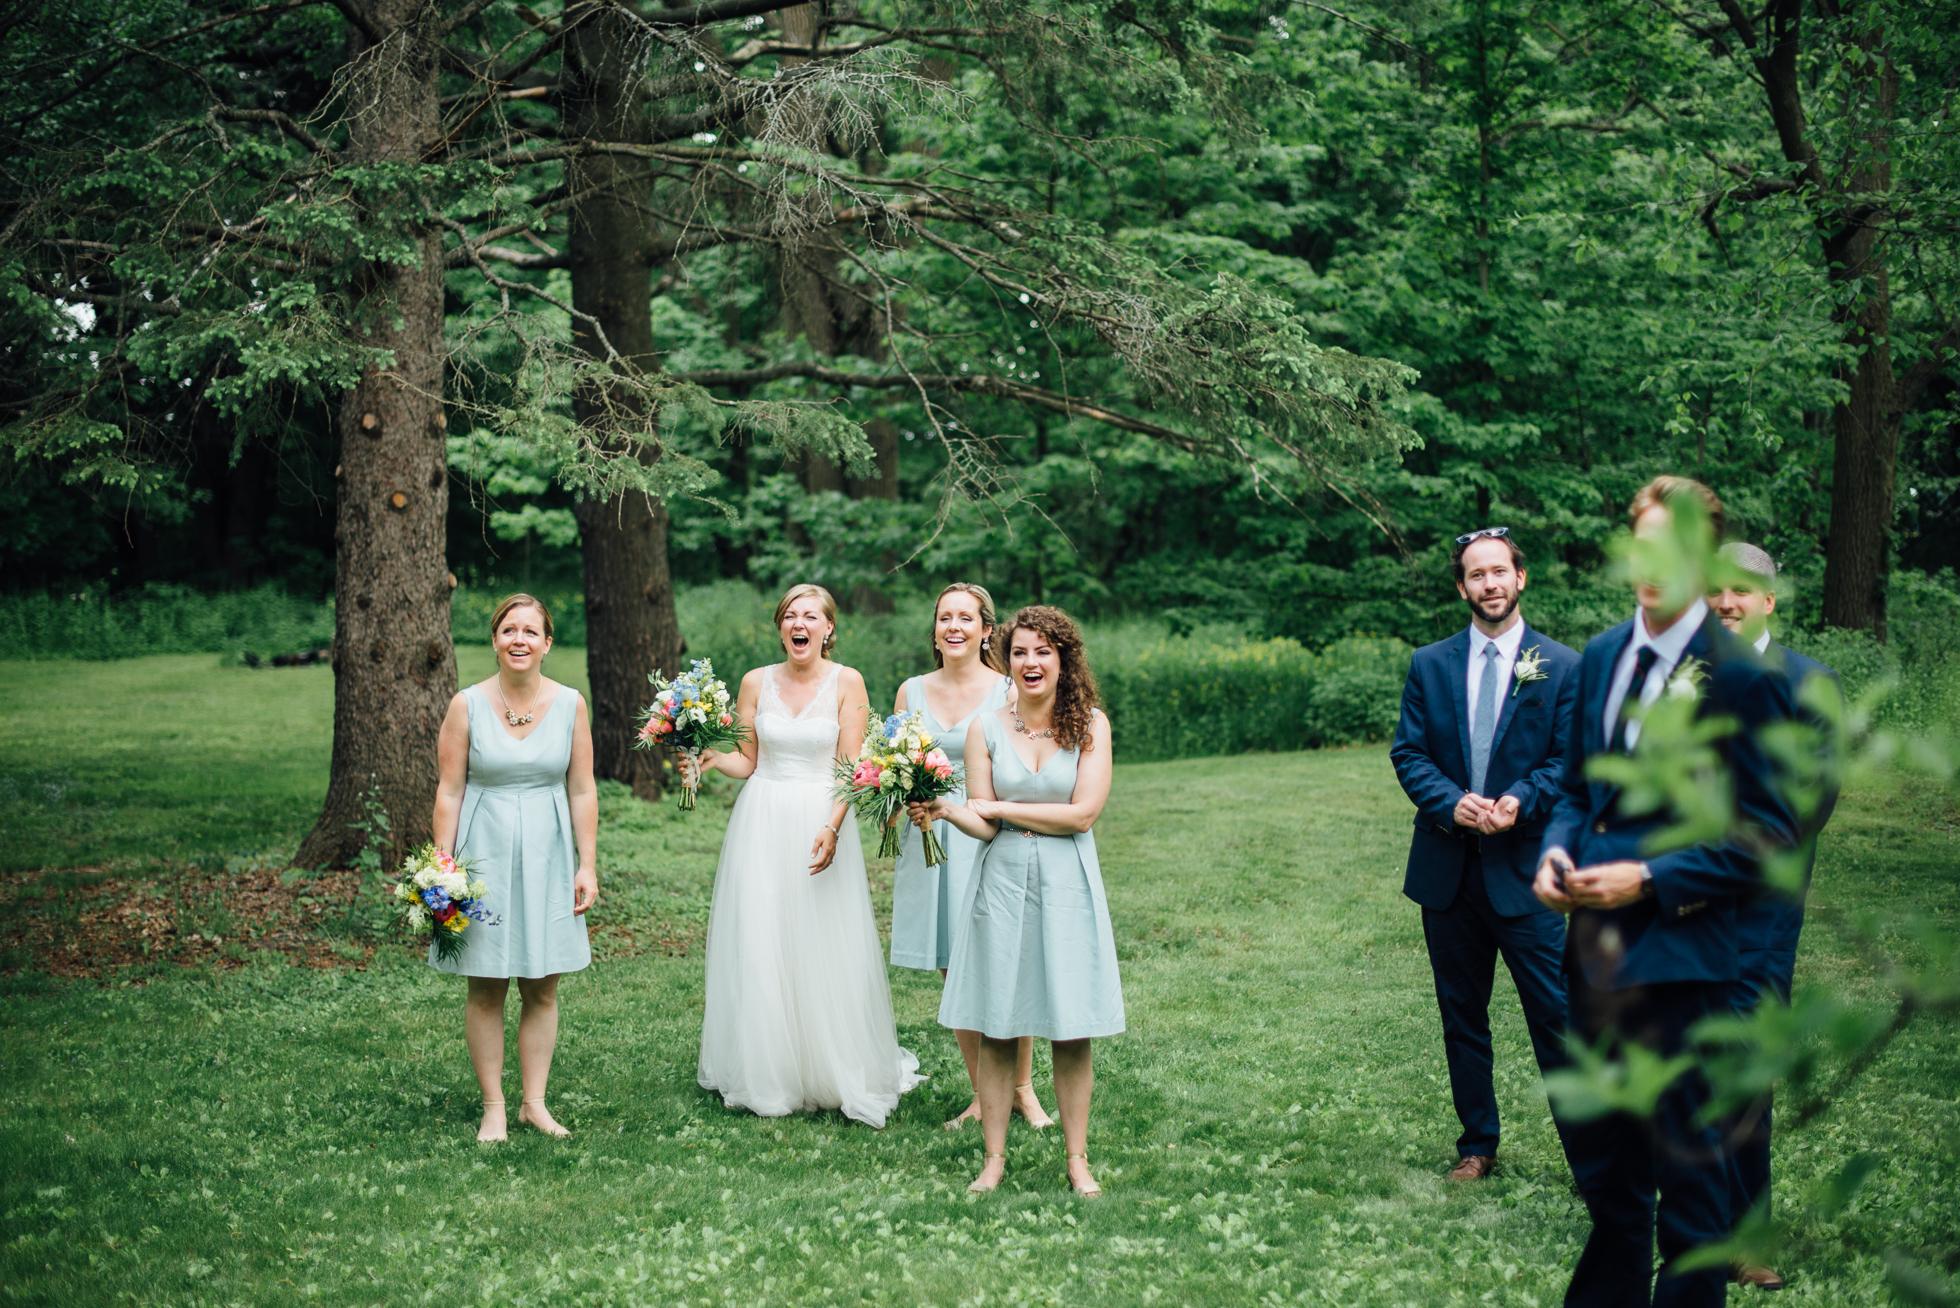 Outdoor-Caledon-Tralee-Wedding-Photography-40